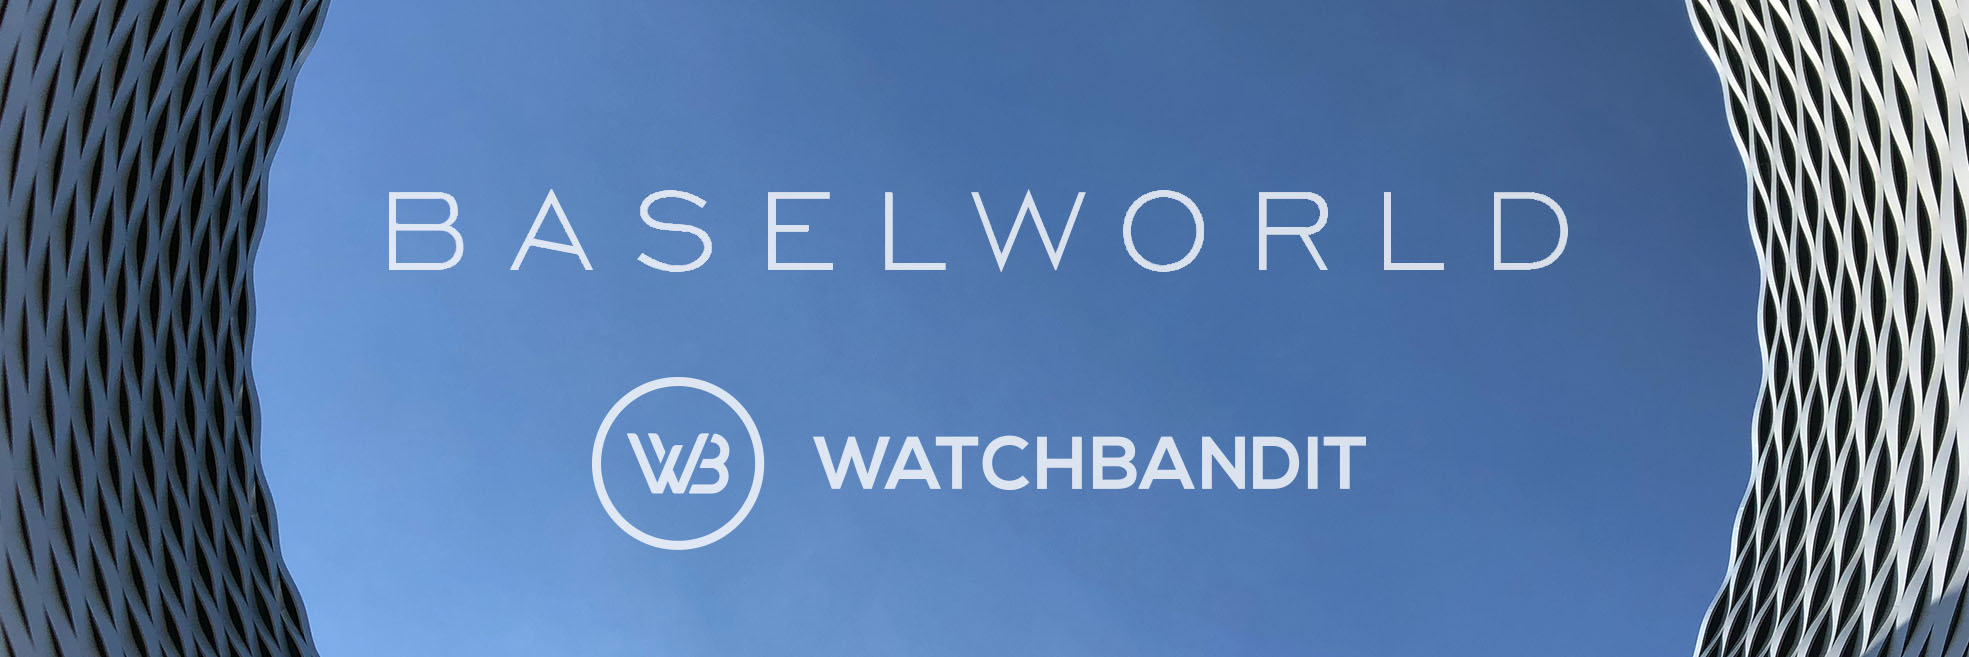 Baselworld_WatchBadnit_Logo